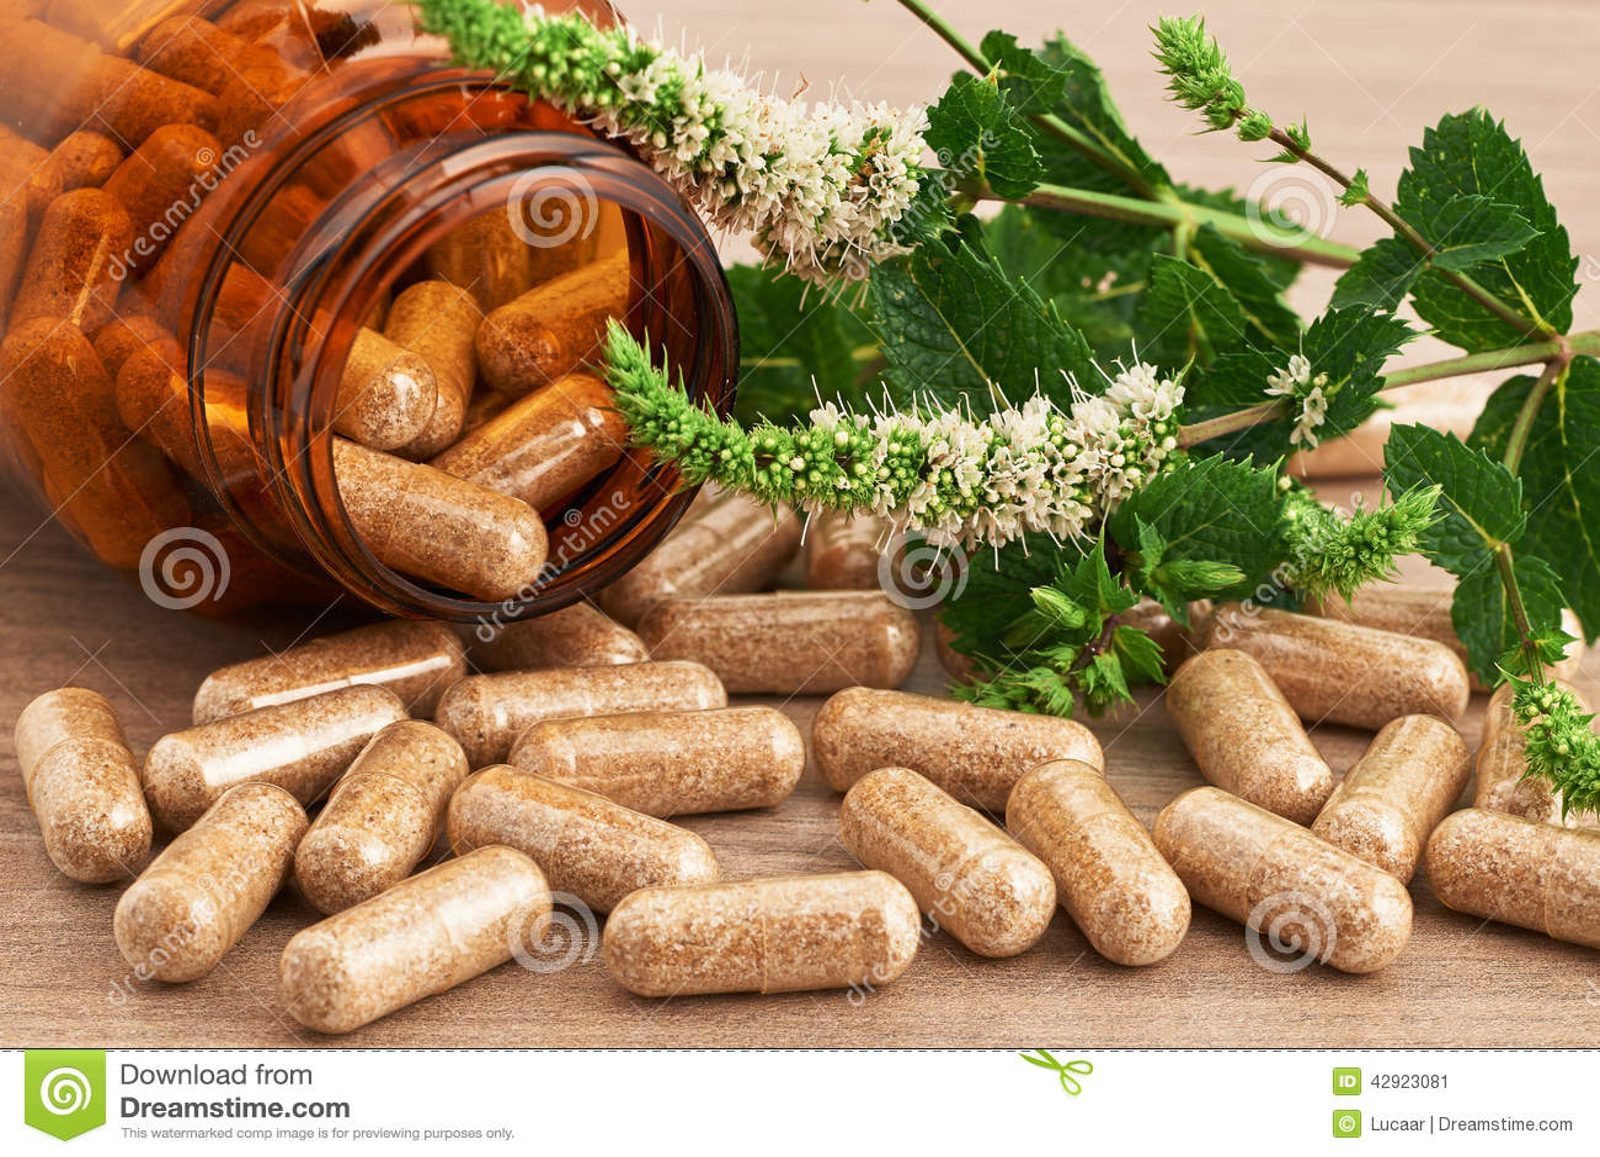 Image source plantsam com - Capsules Green Herbal Medicinal Medicine Medicines Natural Plants Sources